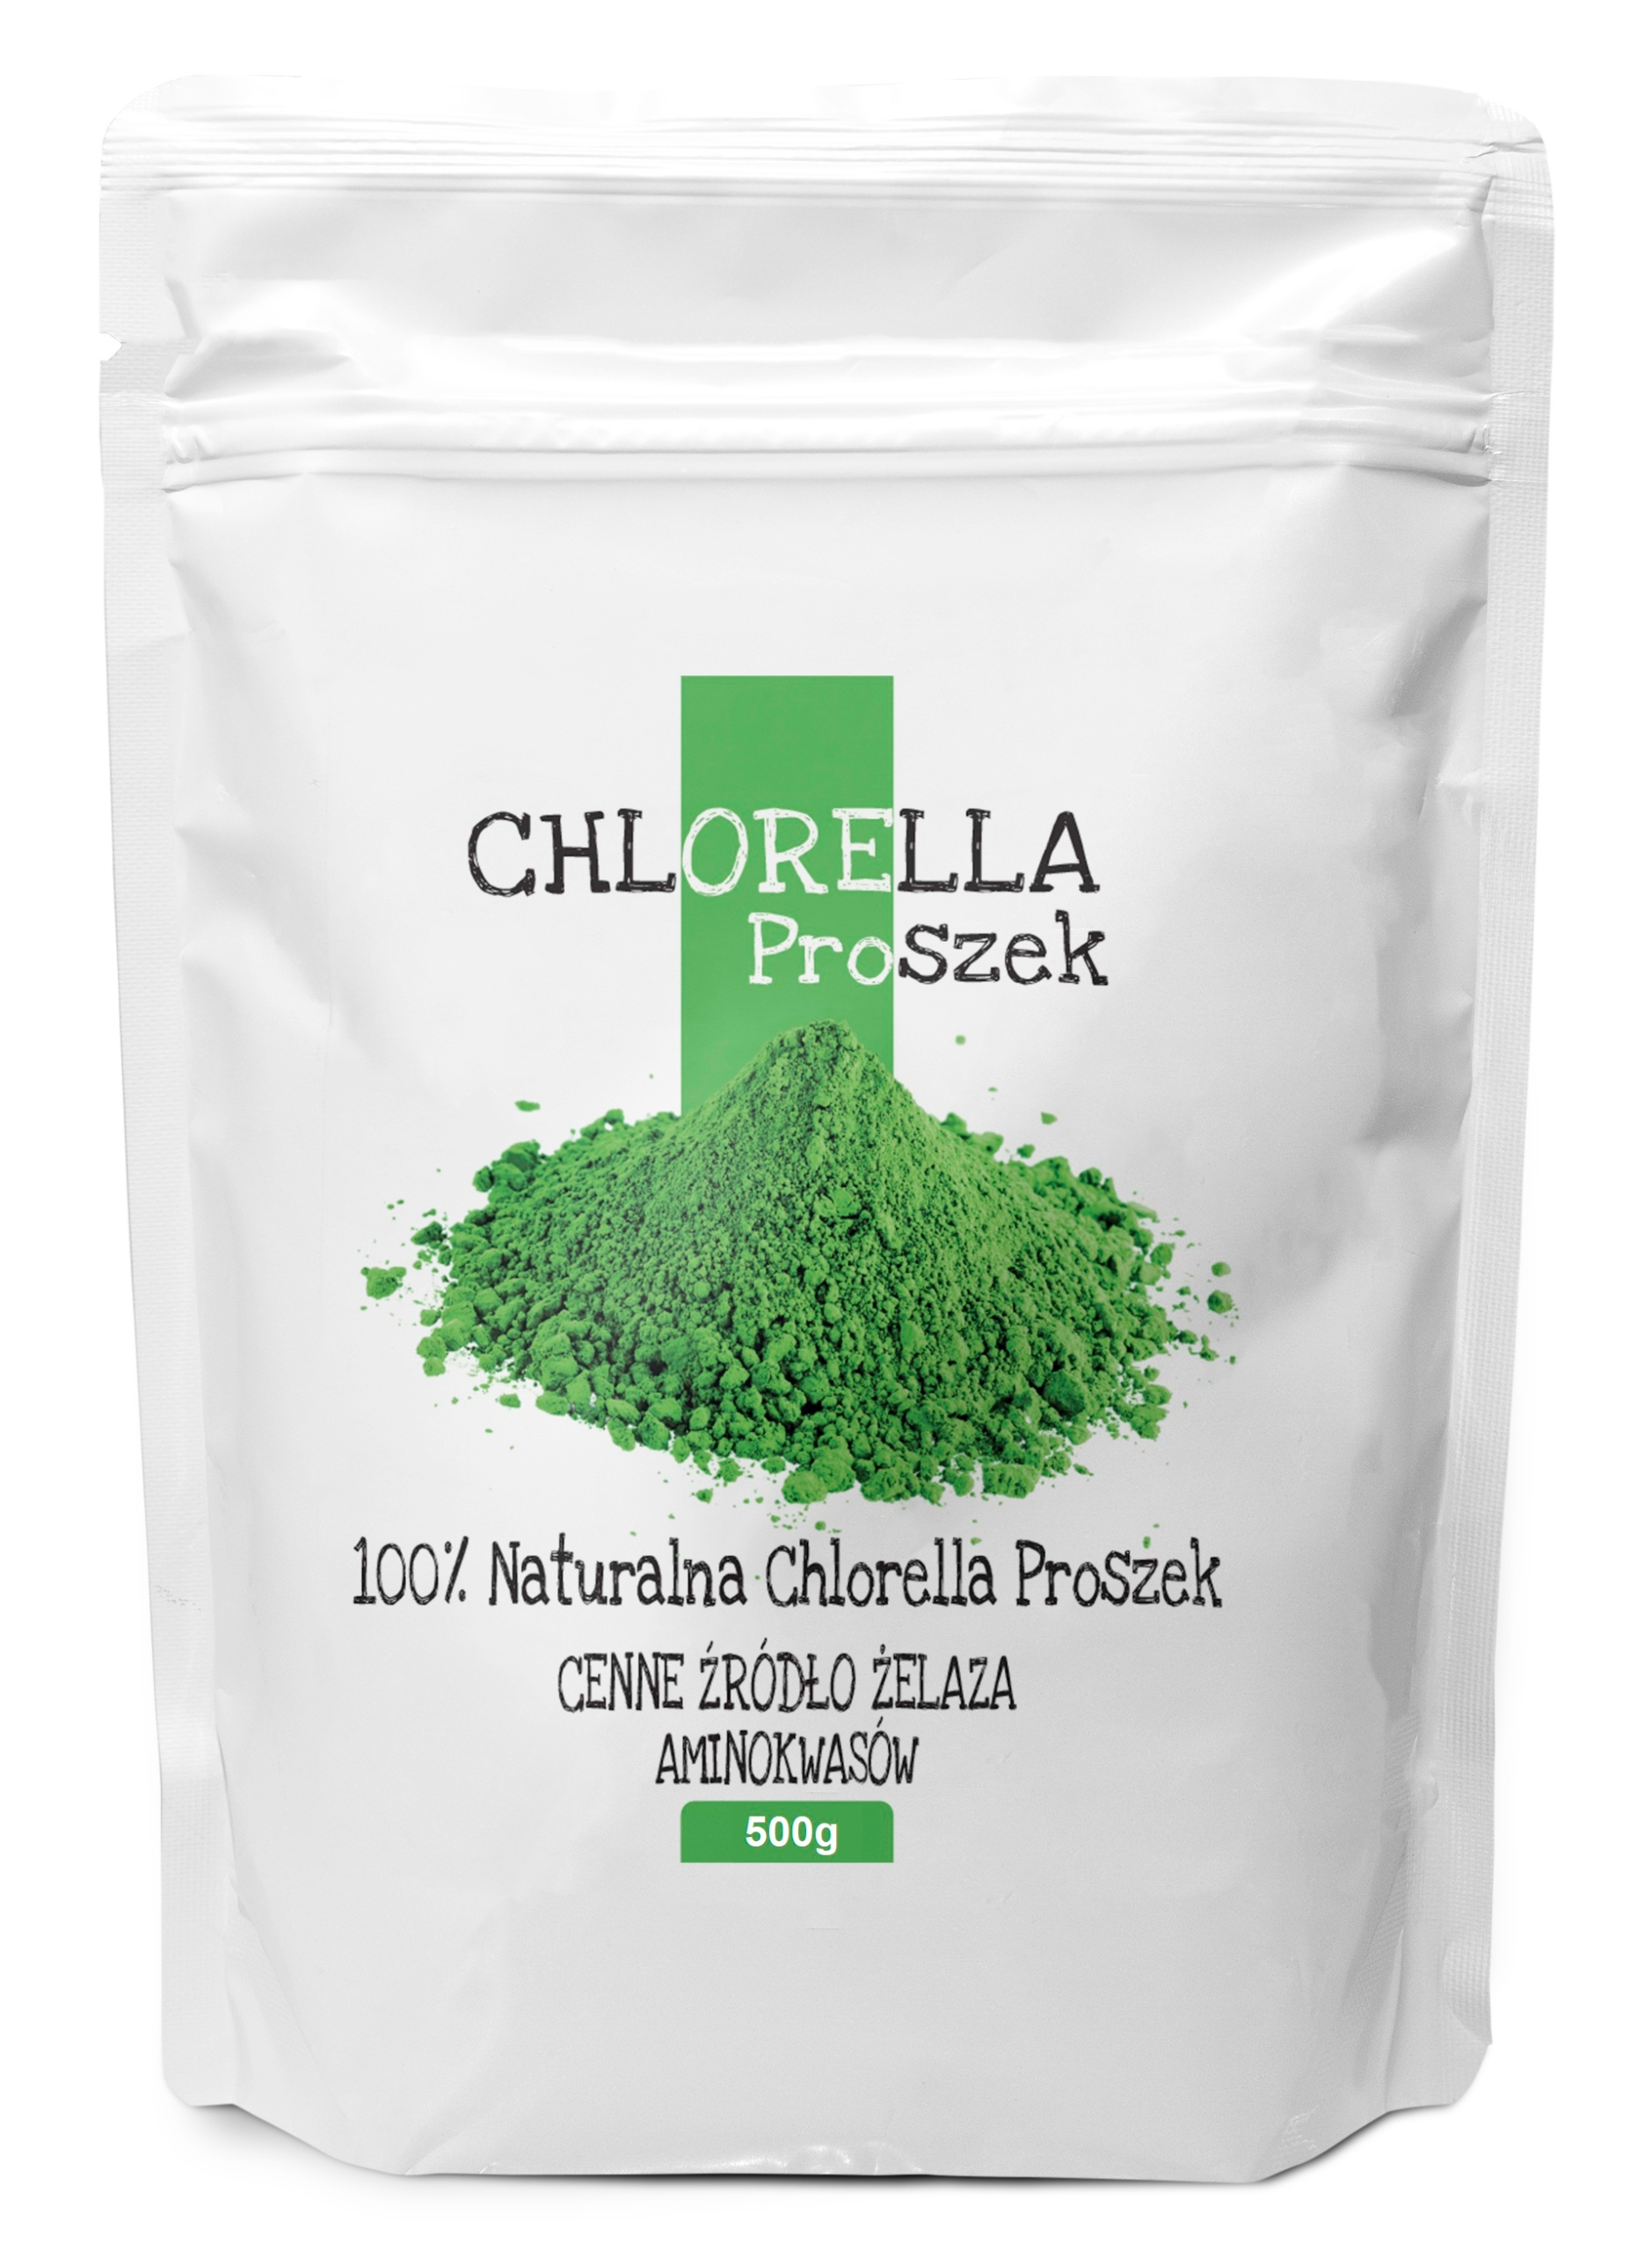 CHLORELLA 500g proszek naturalna, algi / BIOSWENA